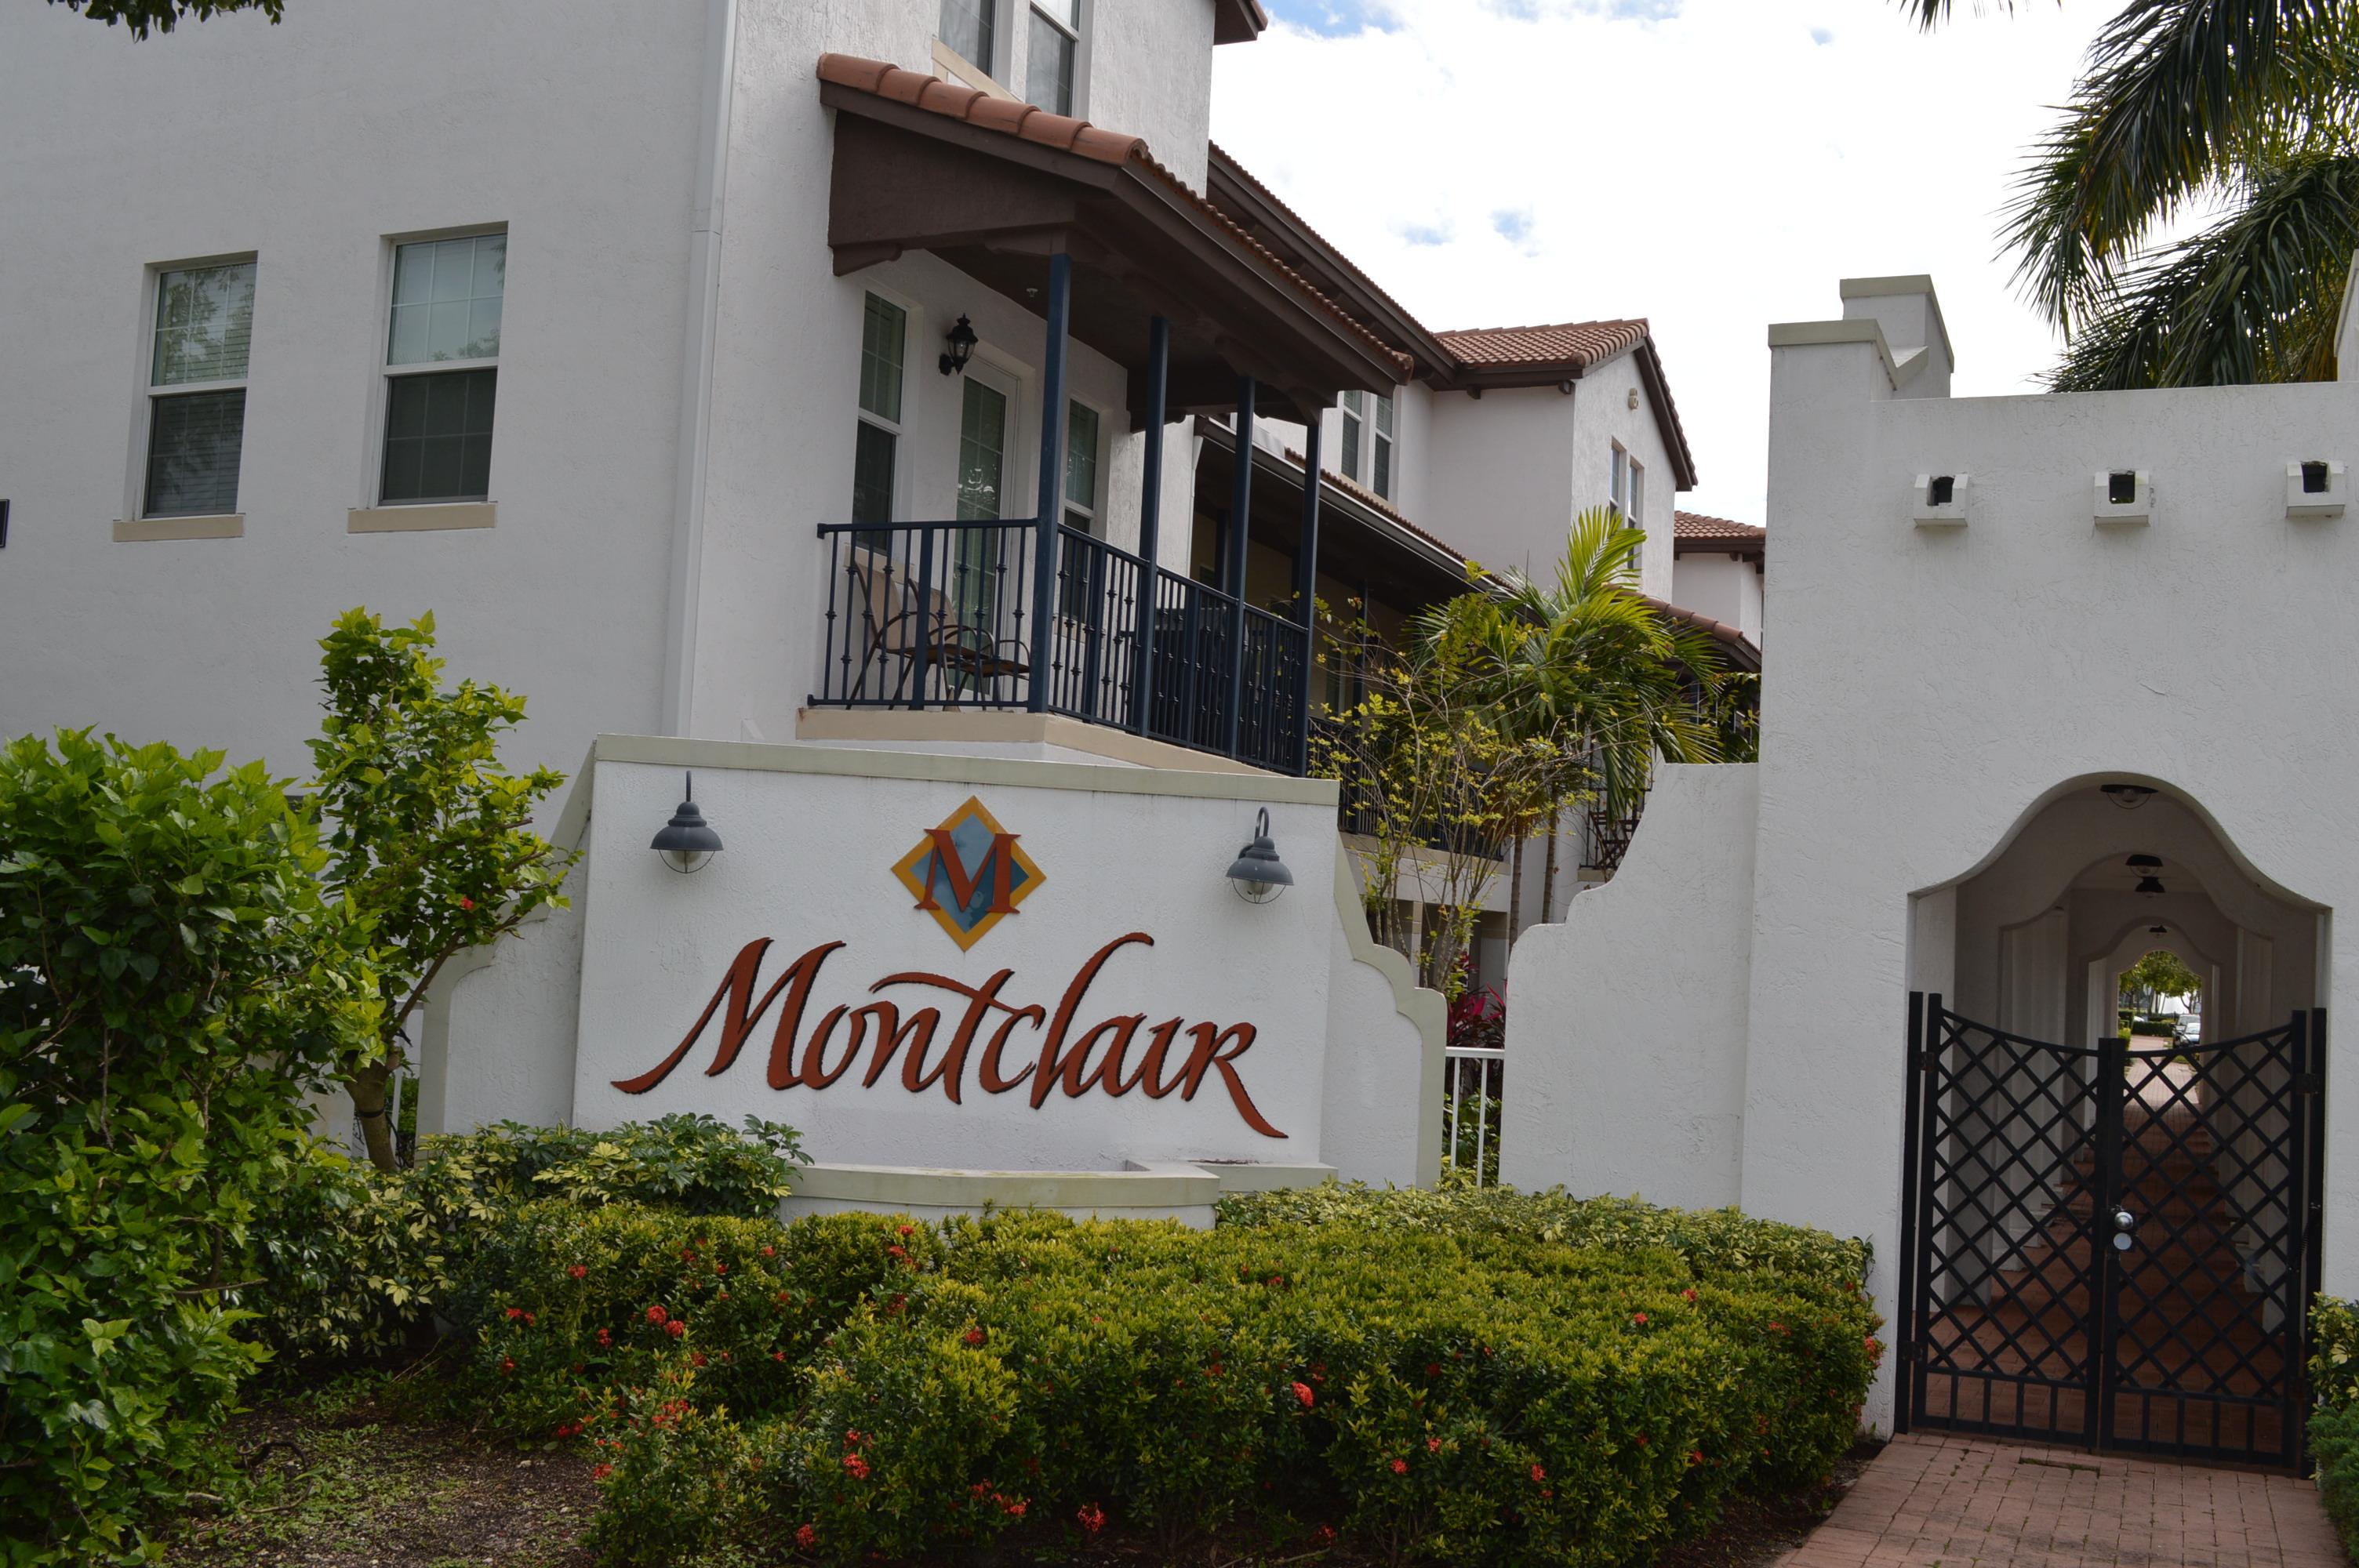 Montclair @ Miramar